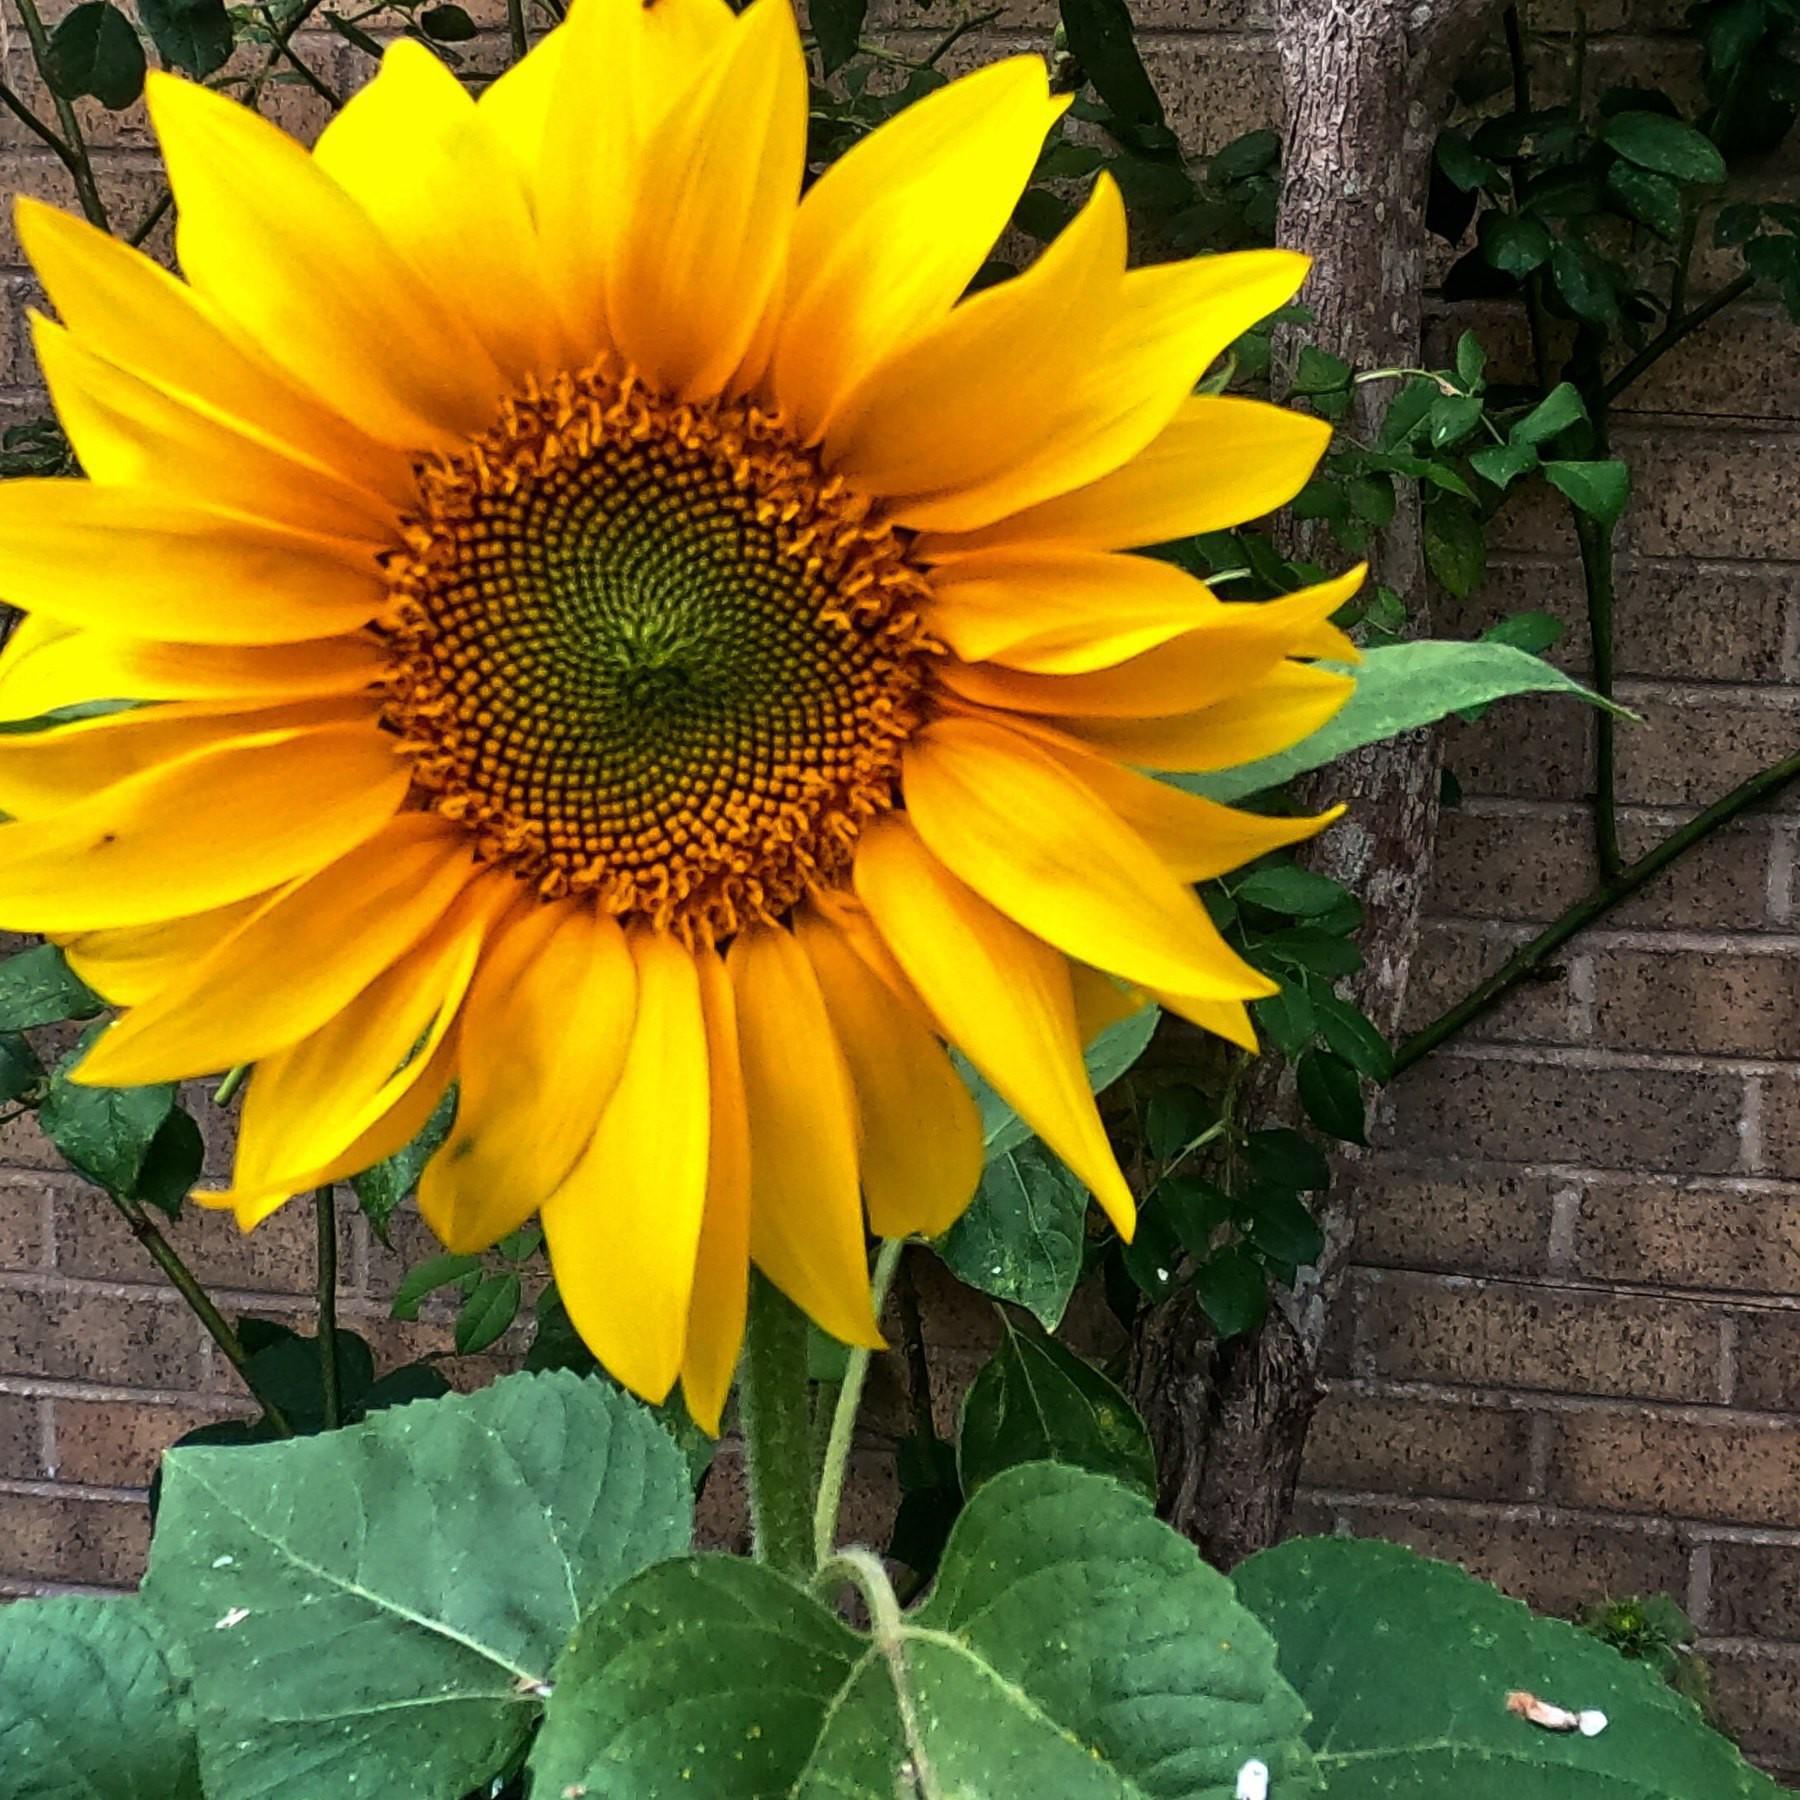 A sunflower in the back garden.